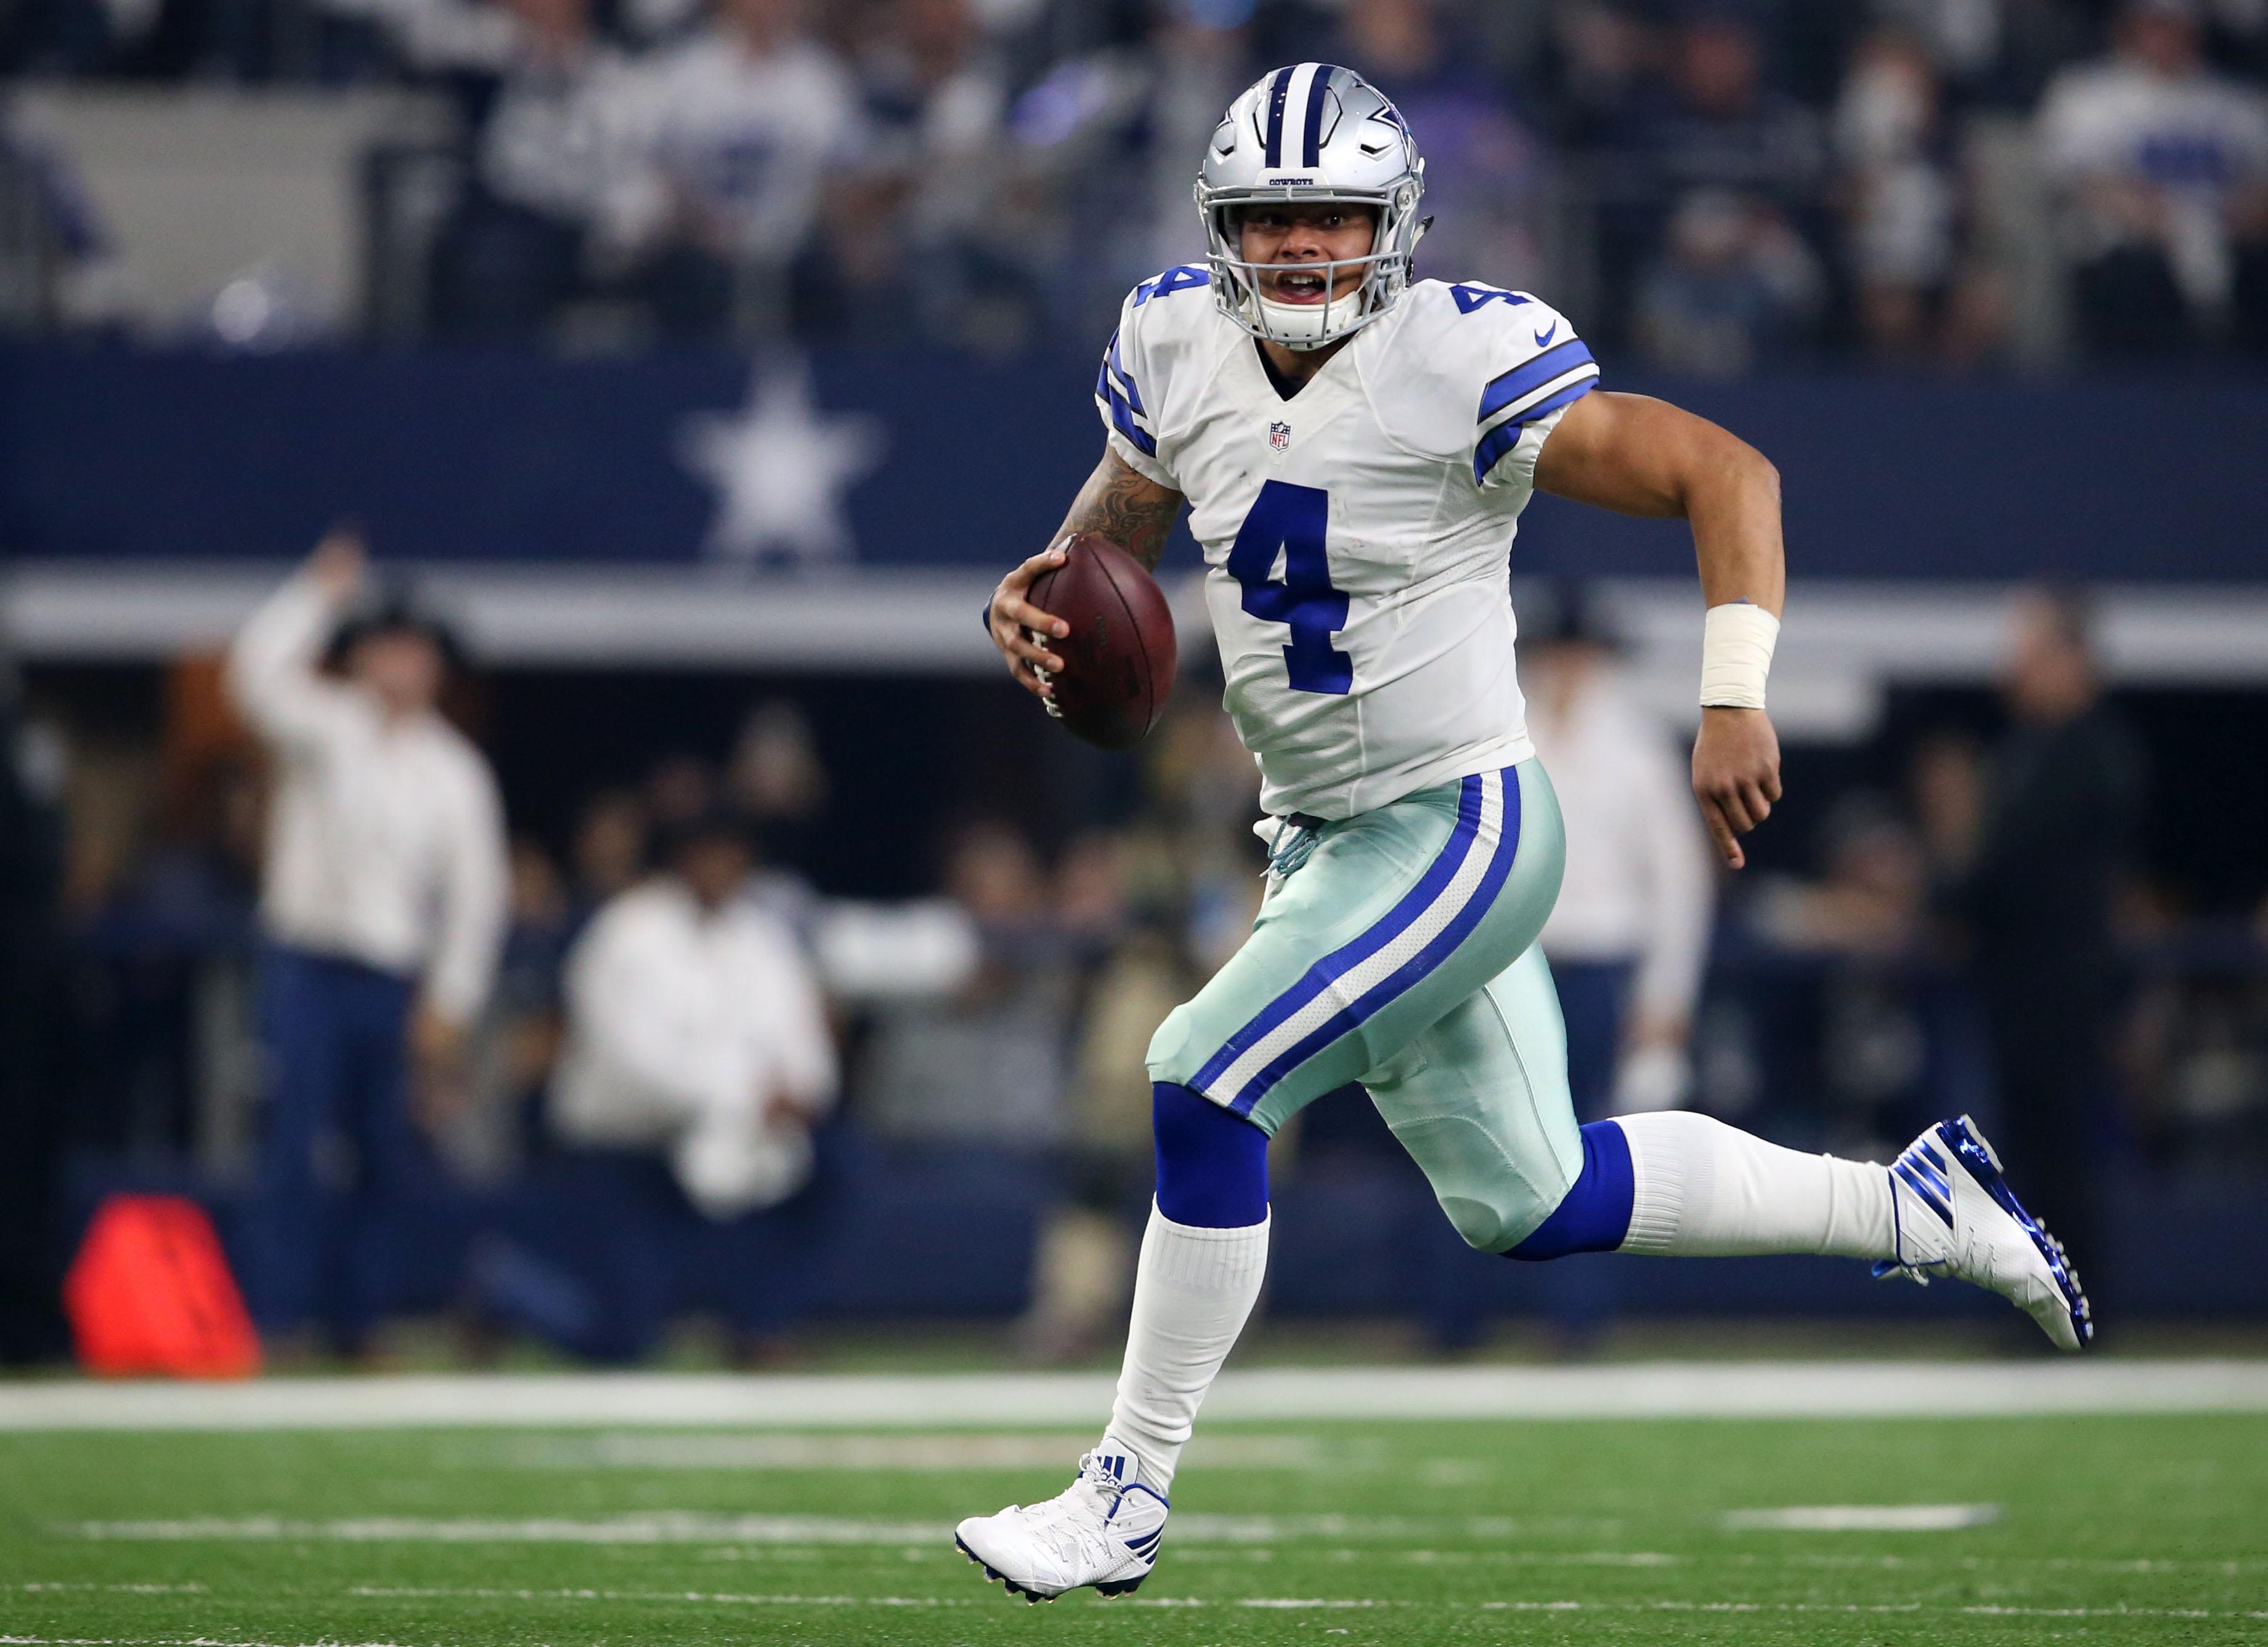 Jan 15 2017 Arlington Tx Usa Dallas Cowboys Quarterback Dak Prescott 4 Runs The Ball During Second Quarter Against Green Bay Packers In